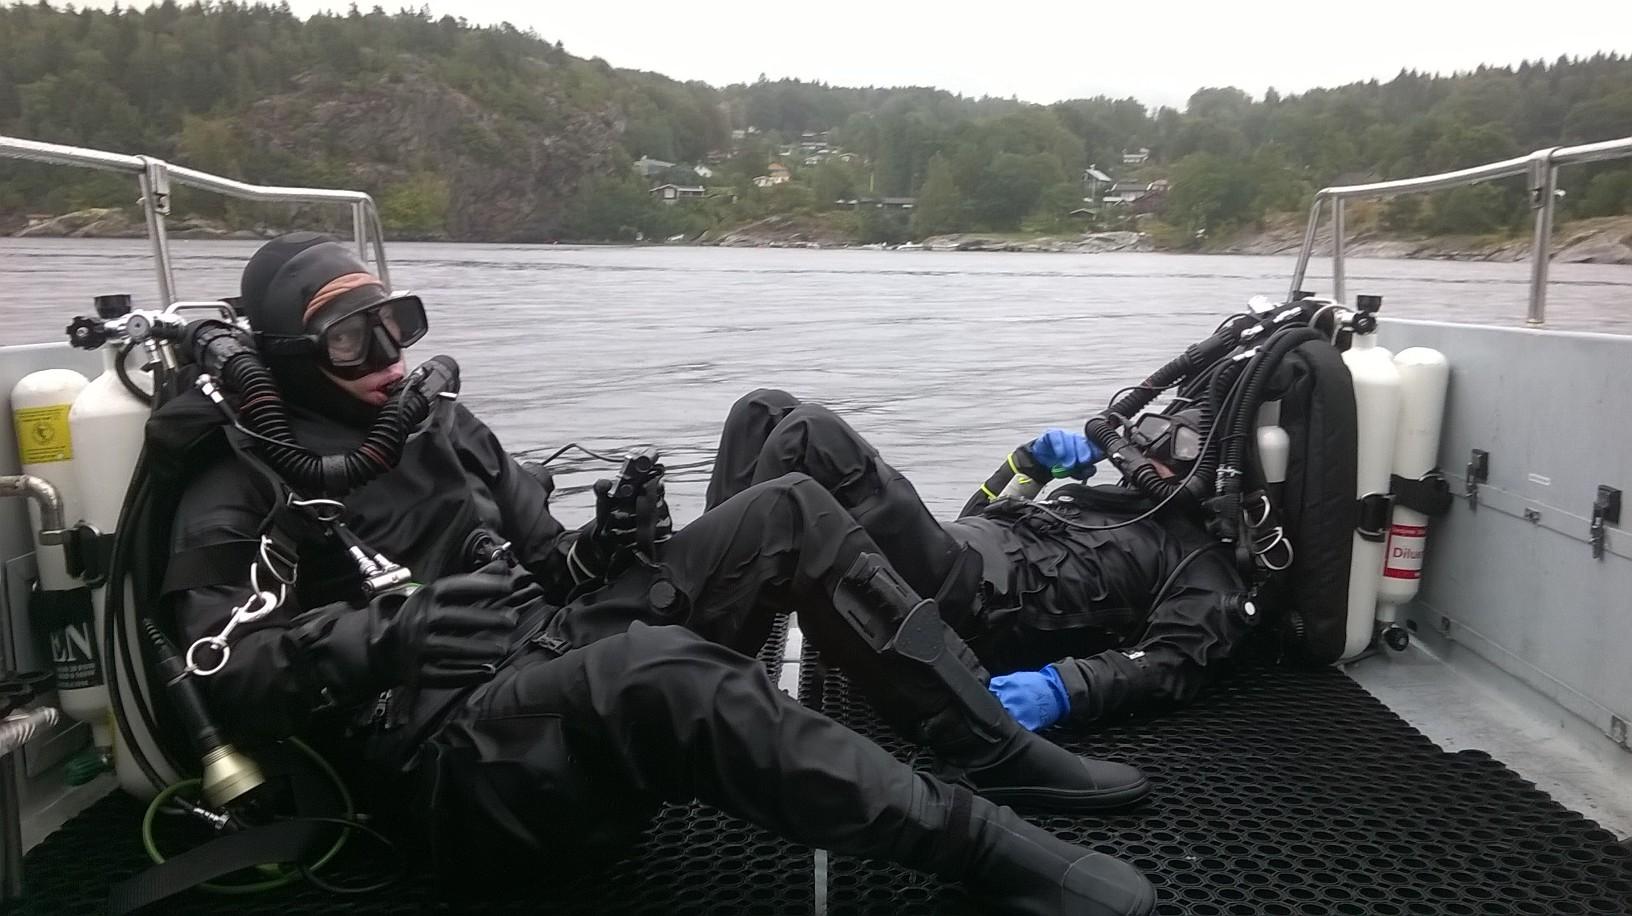 Dykare tar igen sig efter djupdyk